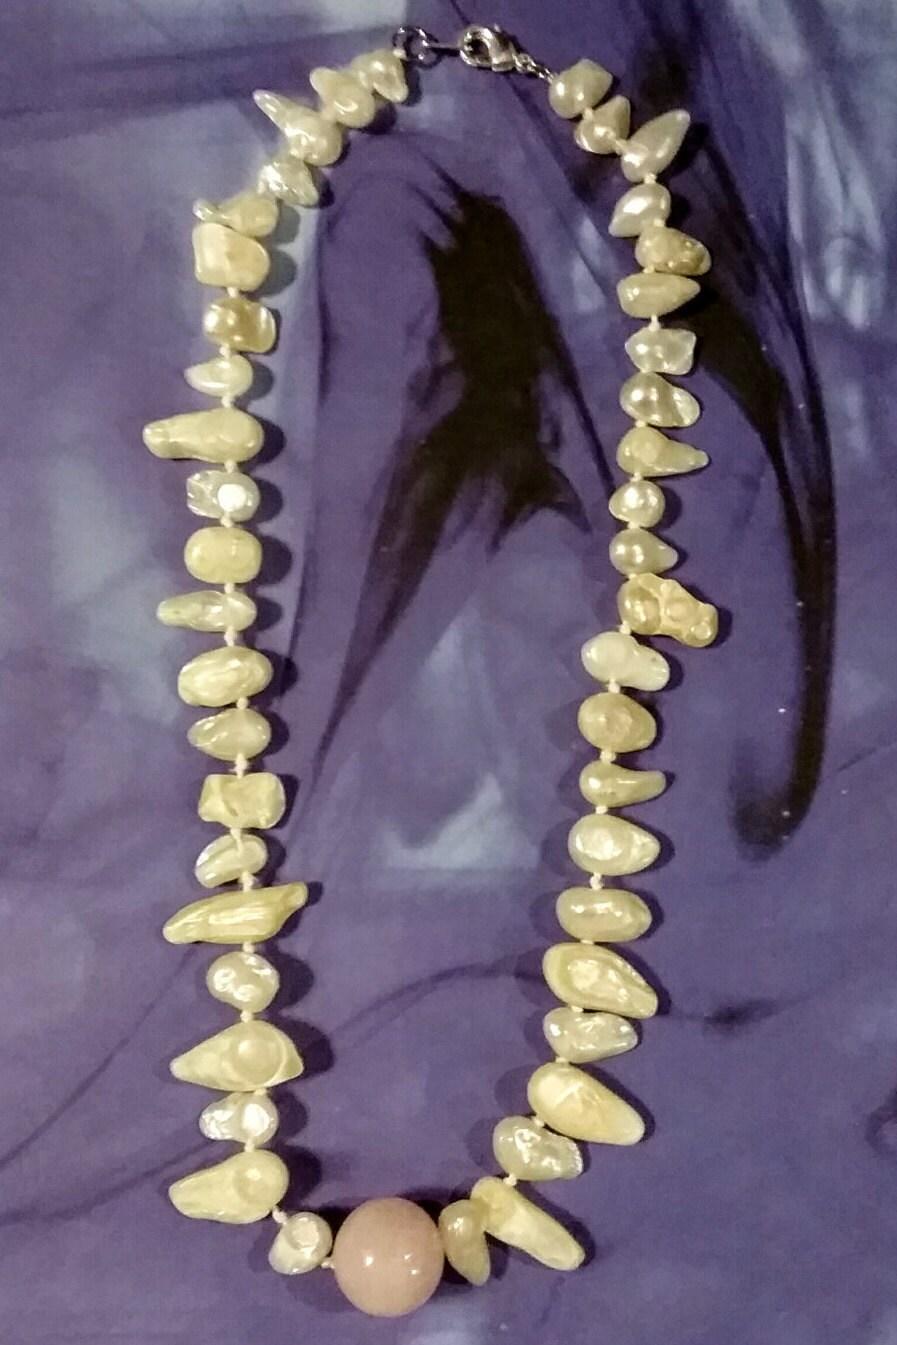 Shikon Jewel Inspired by Inuyasha 14MM Rose Quartz Fresh Water Pearl Silk Thread Nickle-Free Clasp The Shikon no Tama The Jewel of Four Soul